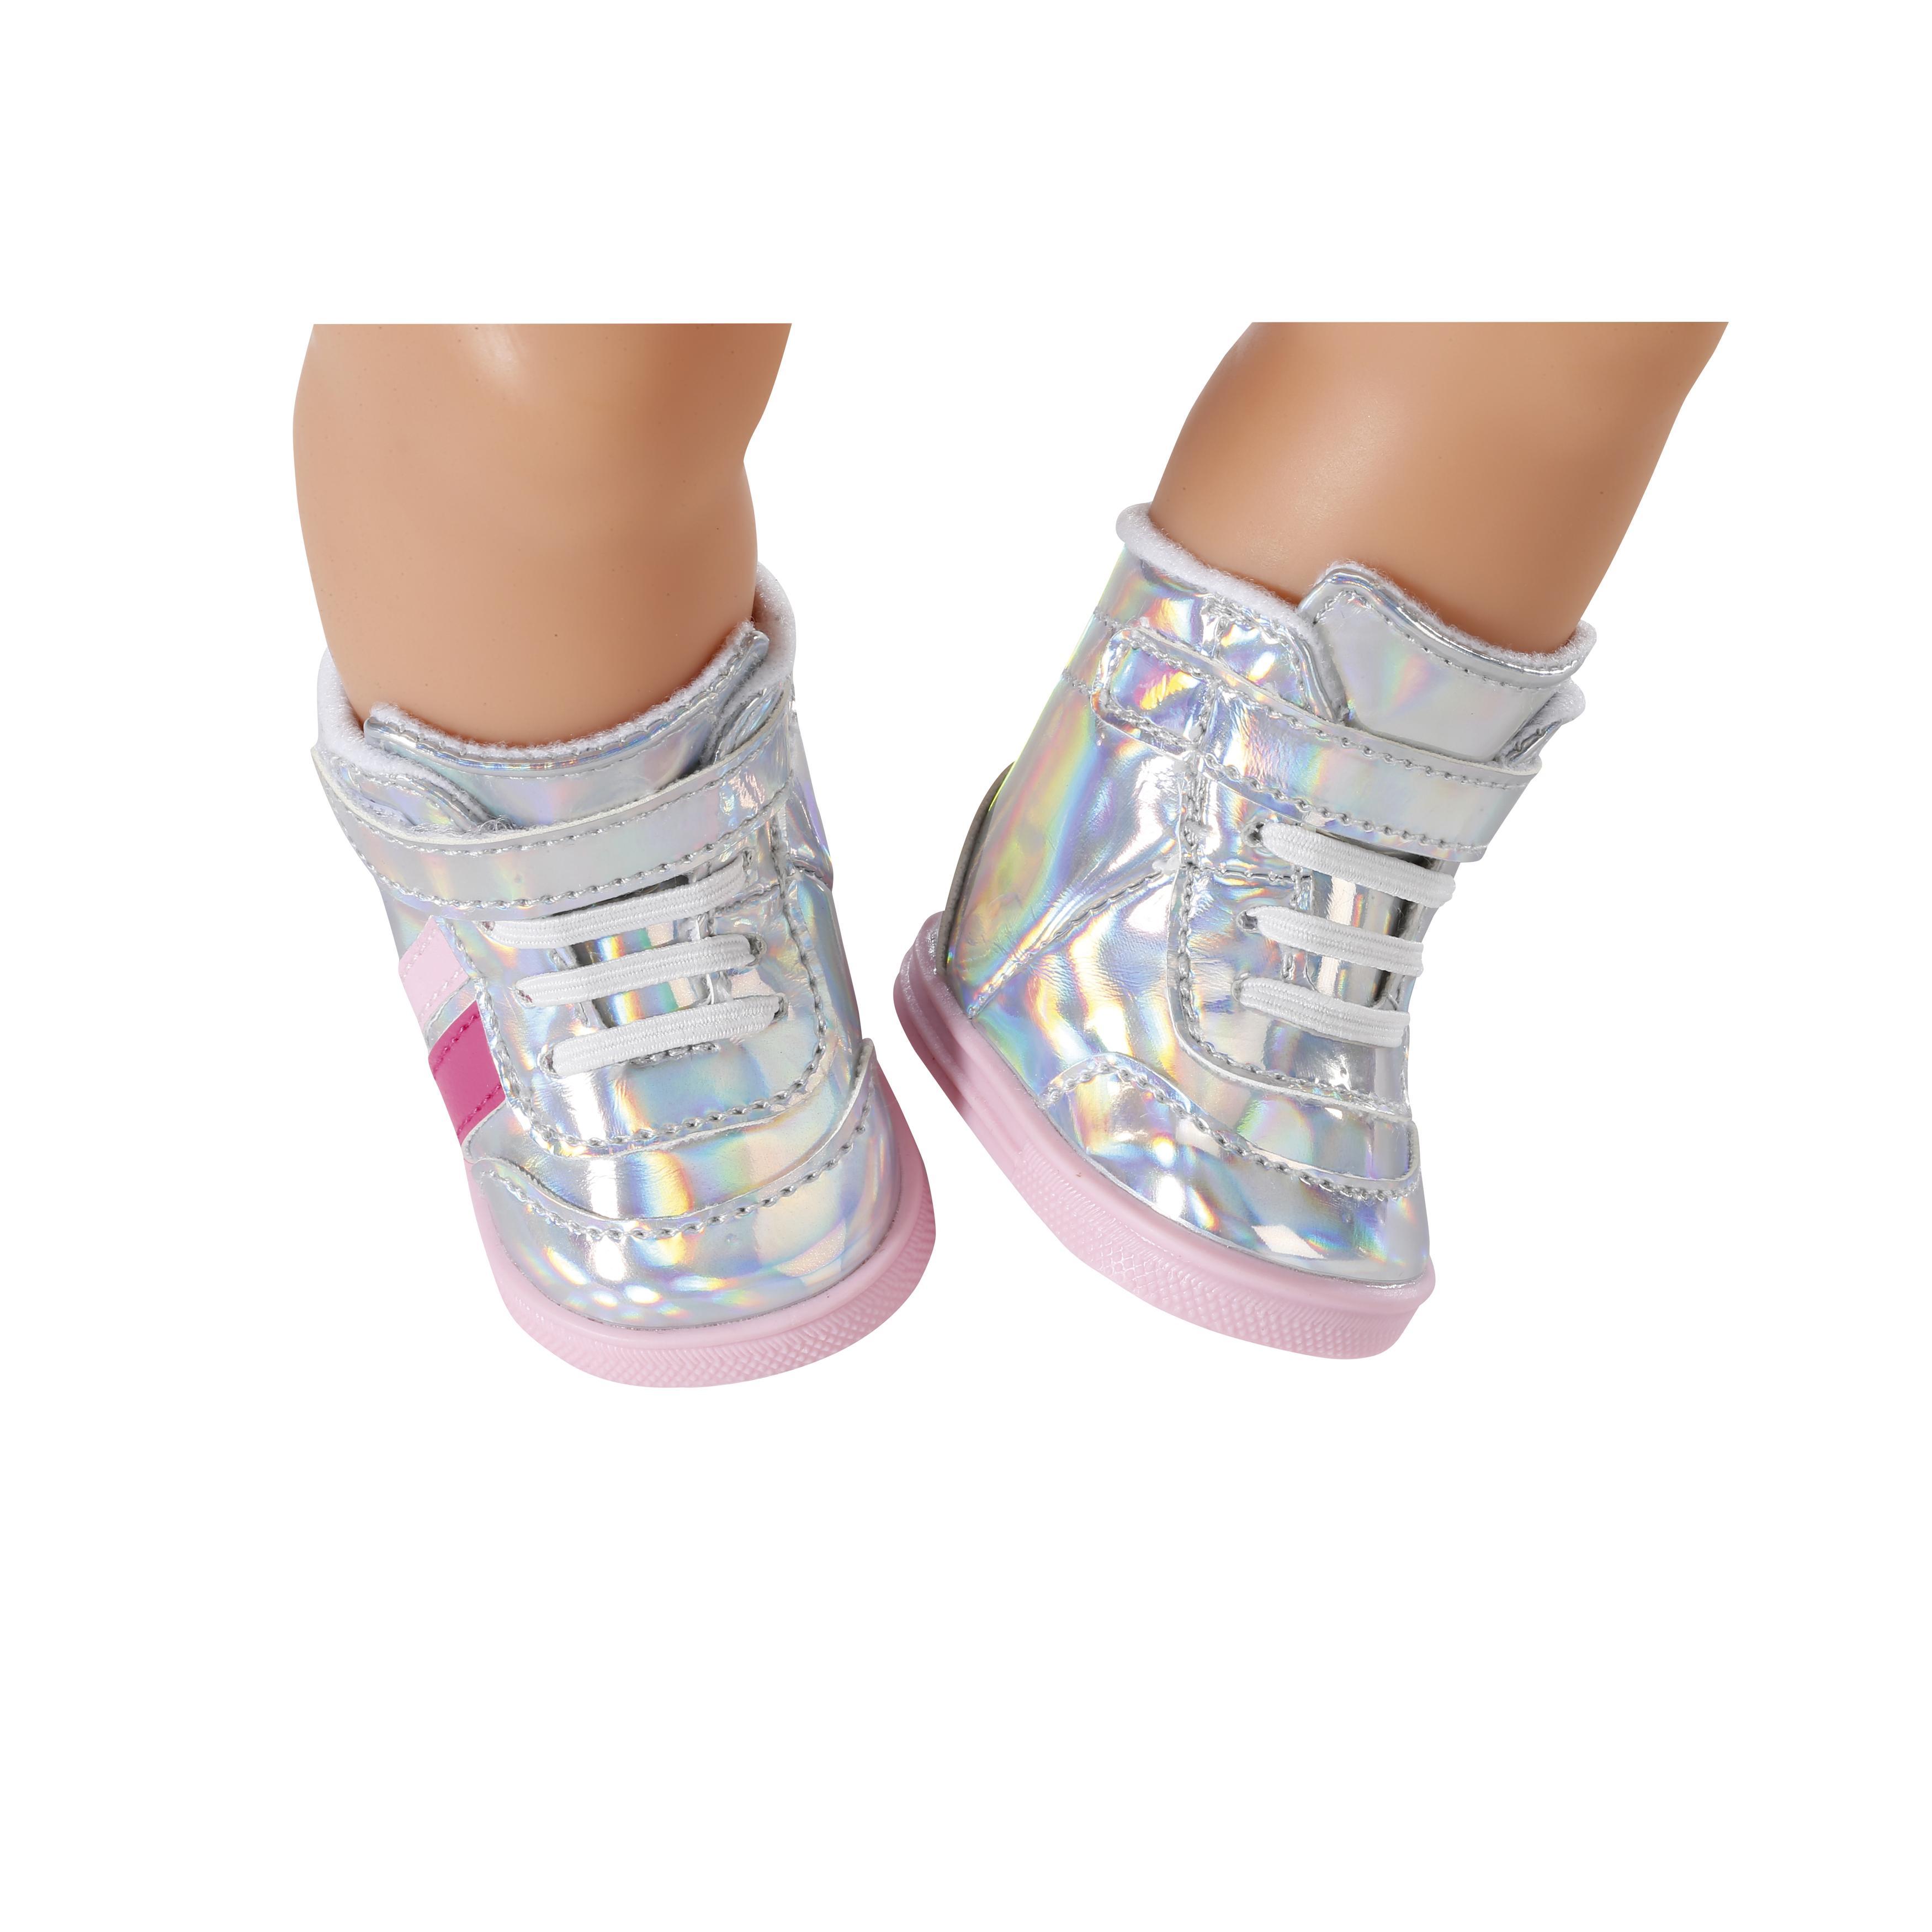 Baby Born Sneakers, 43 cm